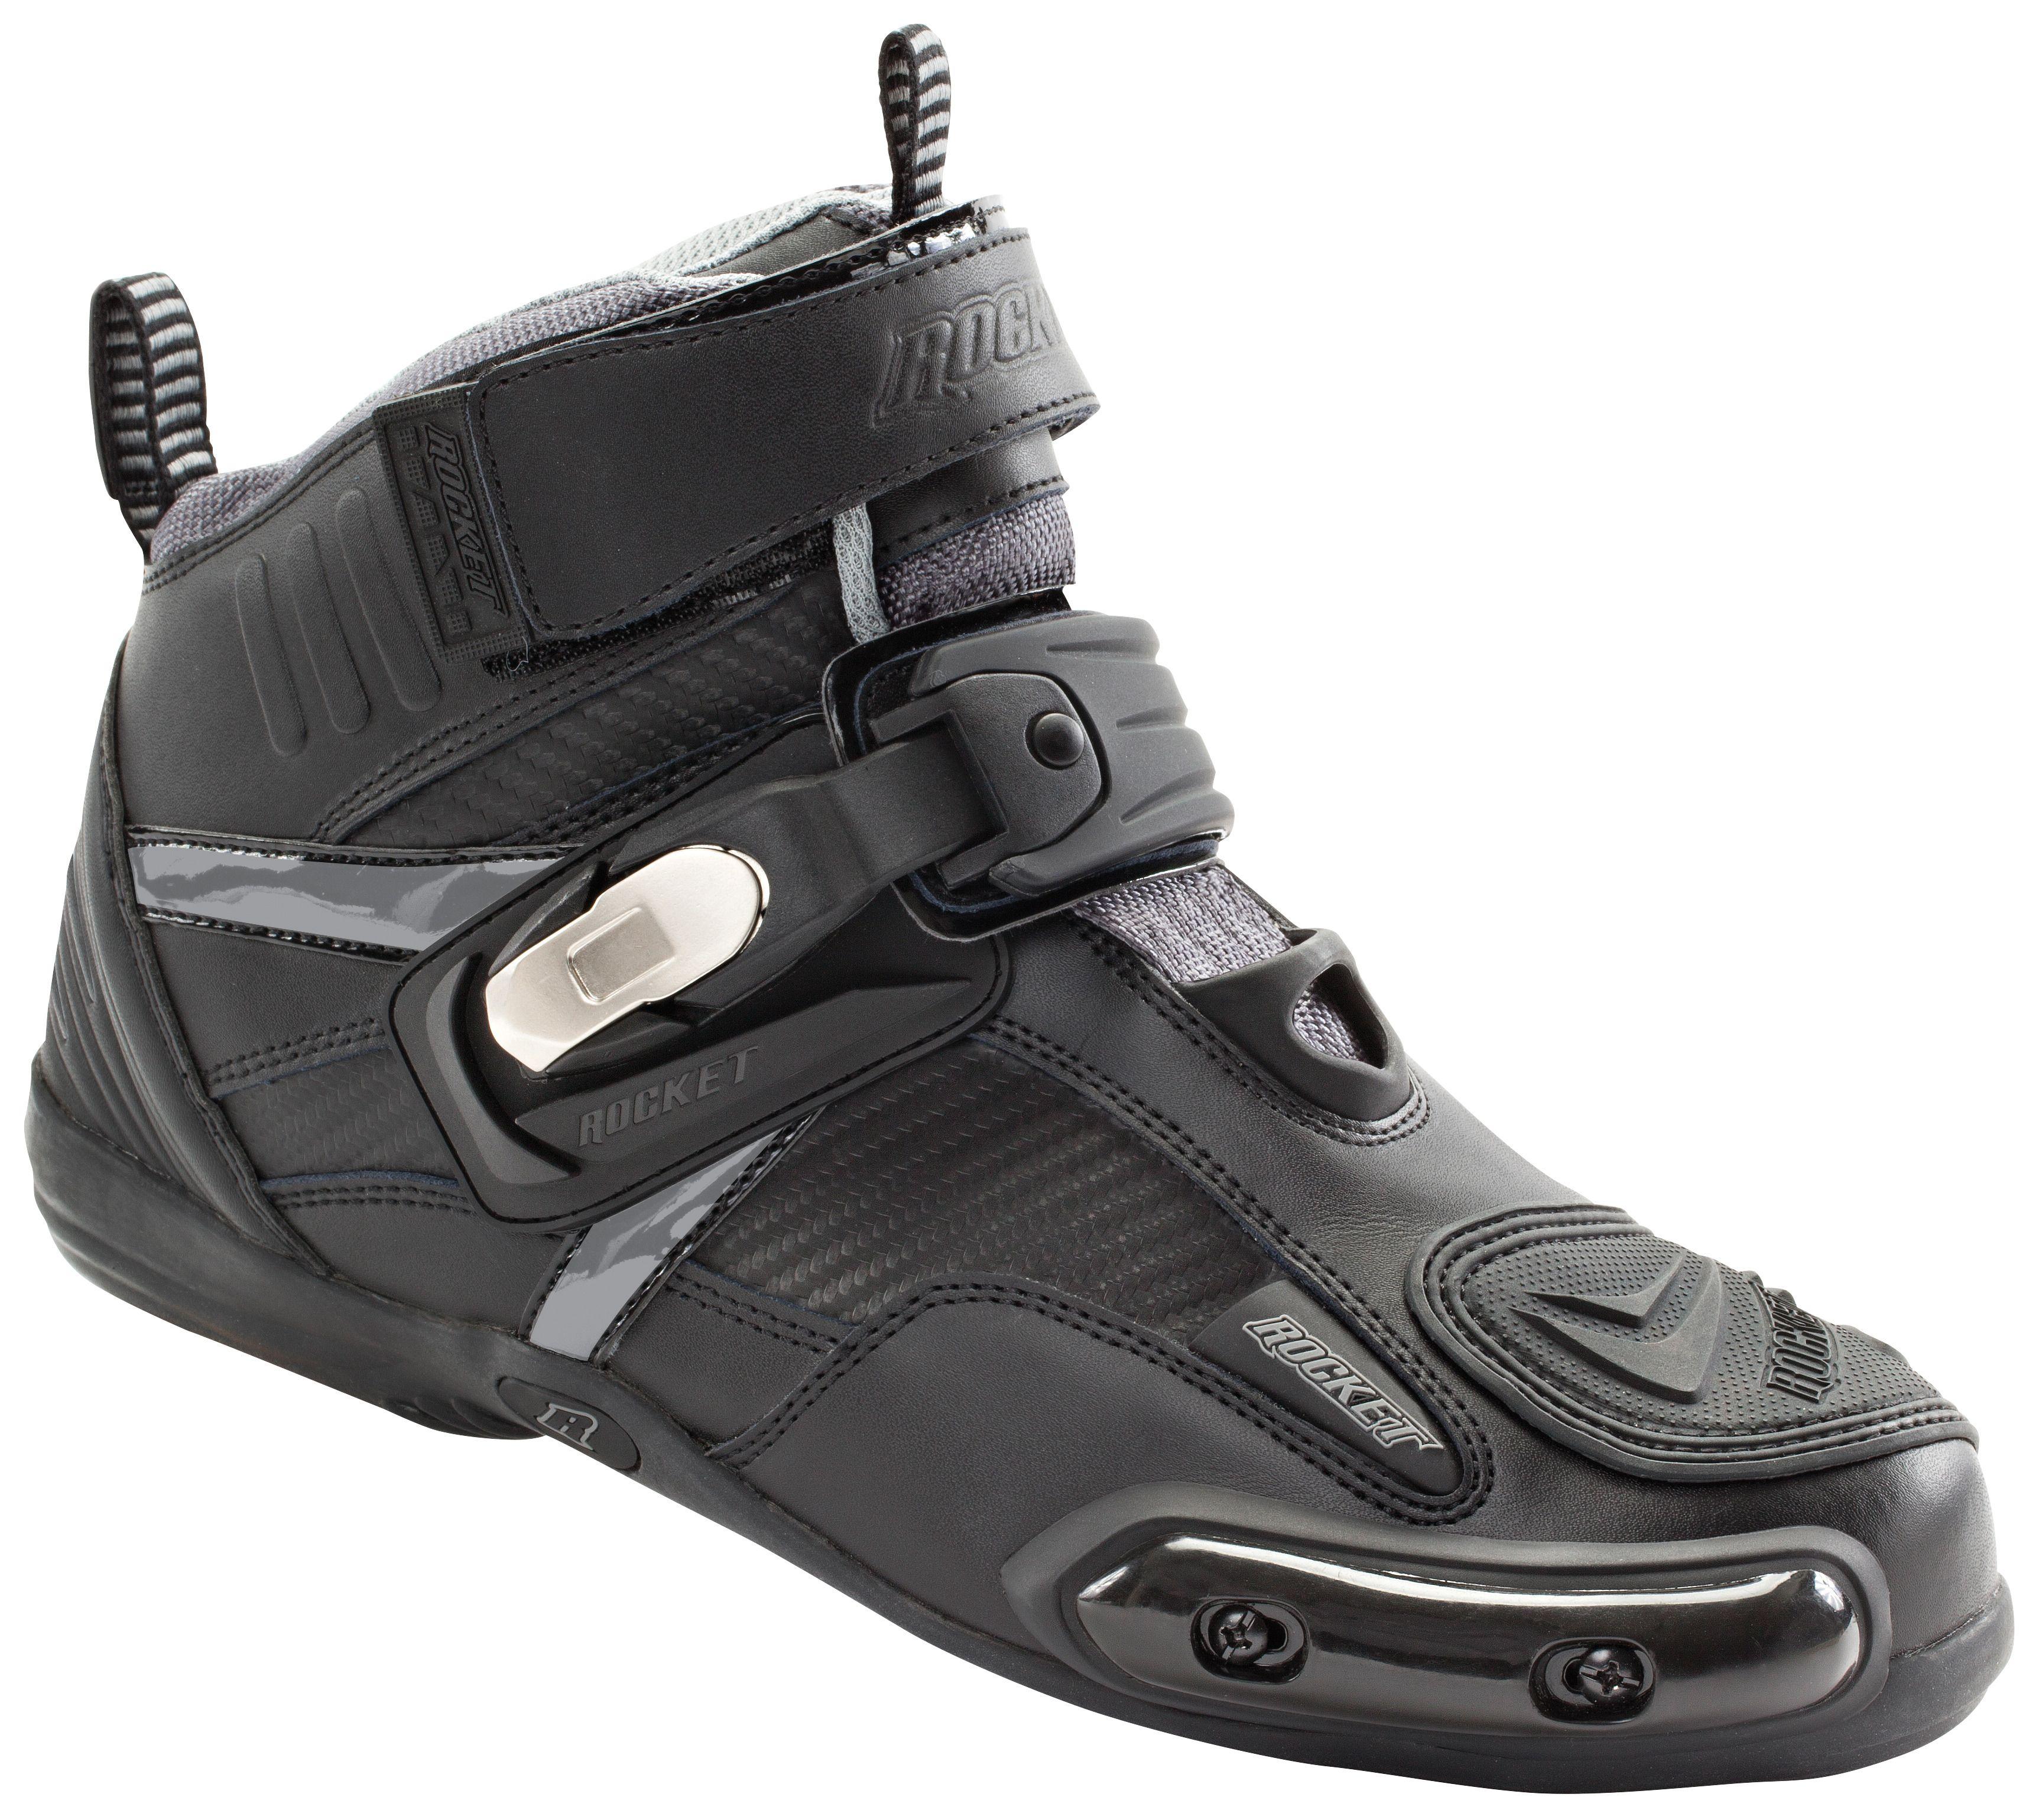 Joe Rocket Atomic Boots | 10% ($12.00) - 1016.7KB